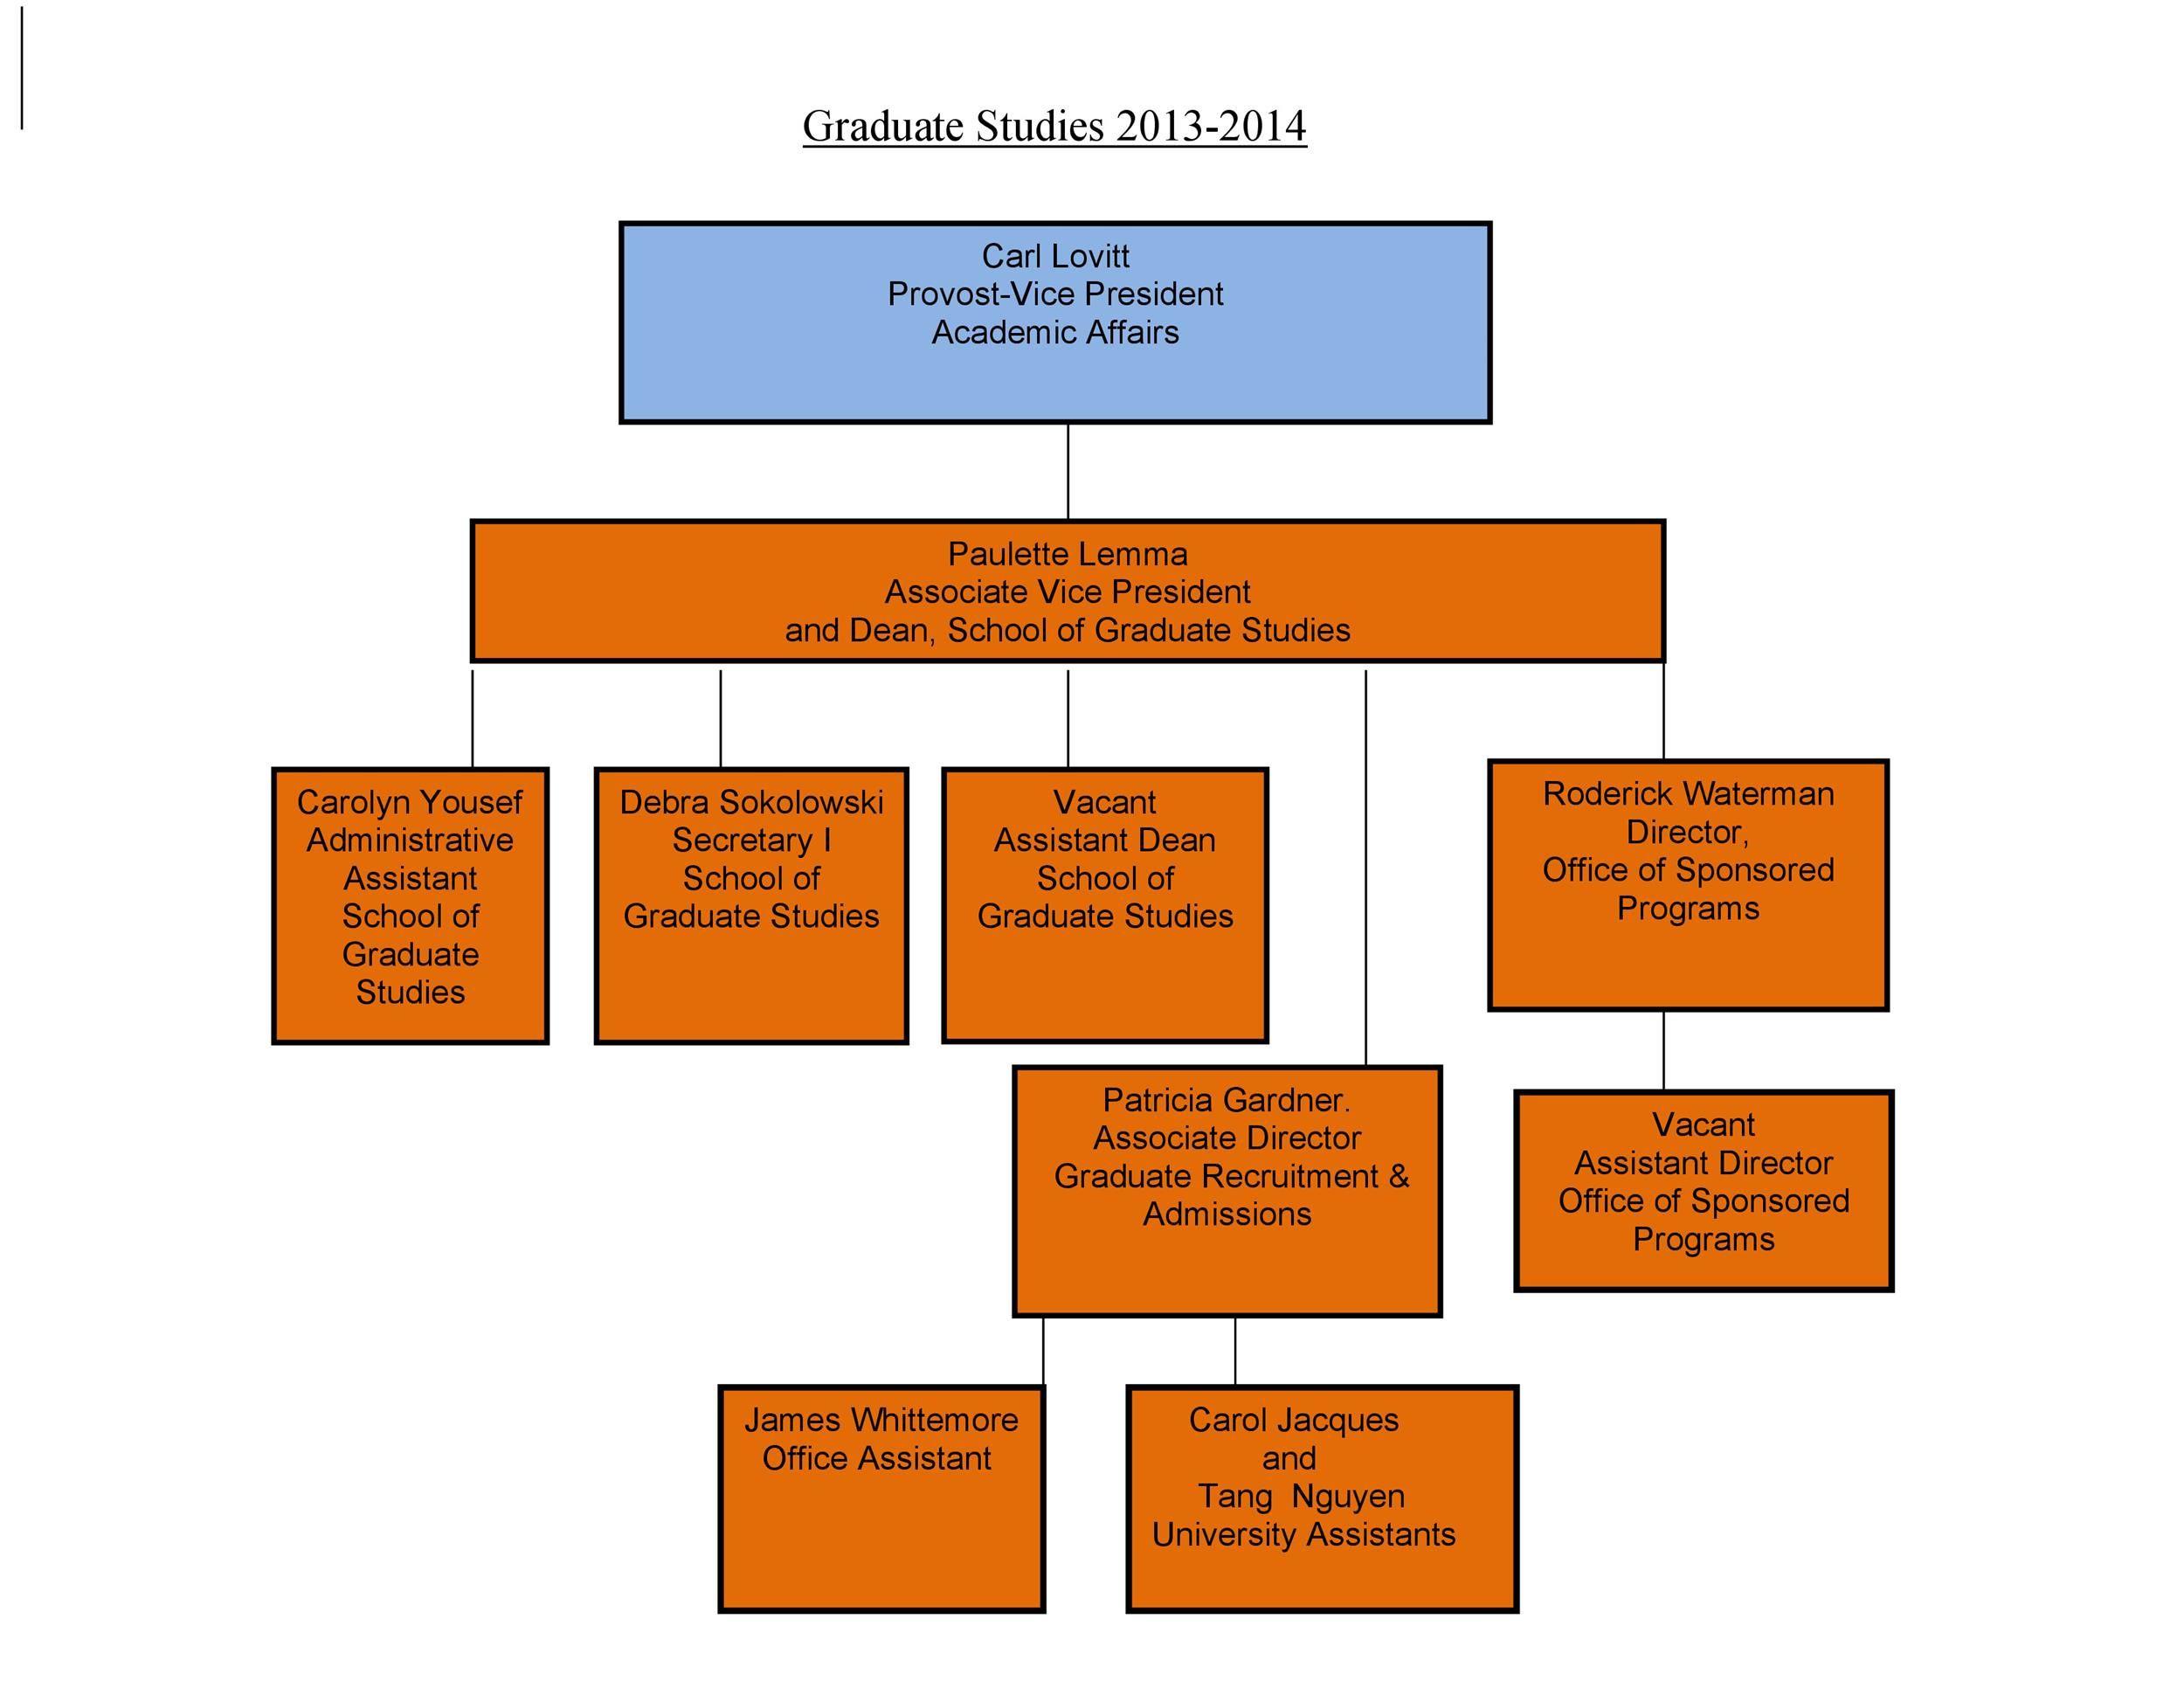 006 Sensational Organization Chart Template Word 2013 Picture  Organizational Free MicrosoftFull